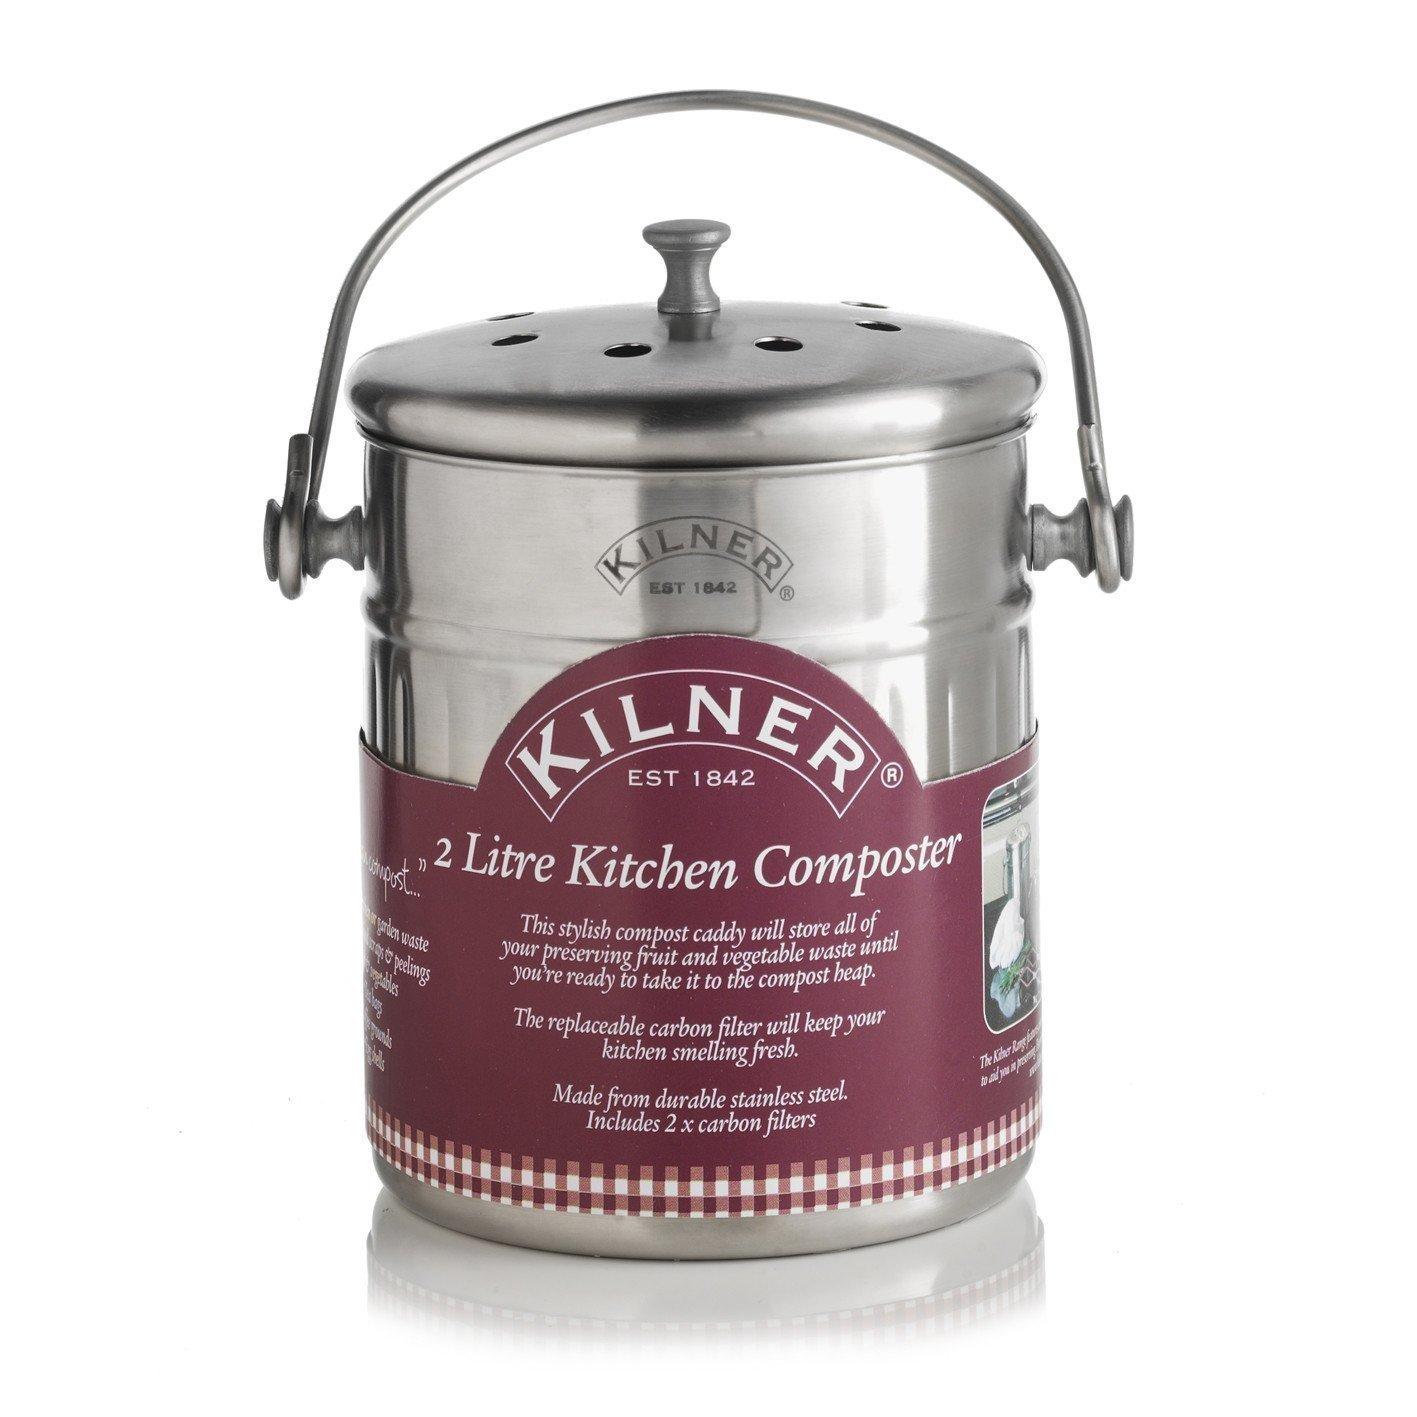 Kilner 0025.416 2 Litre Kitchen Composter, Silver Rayware